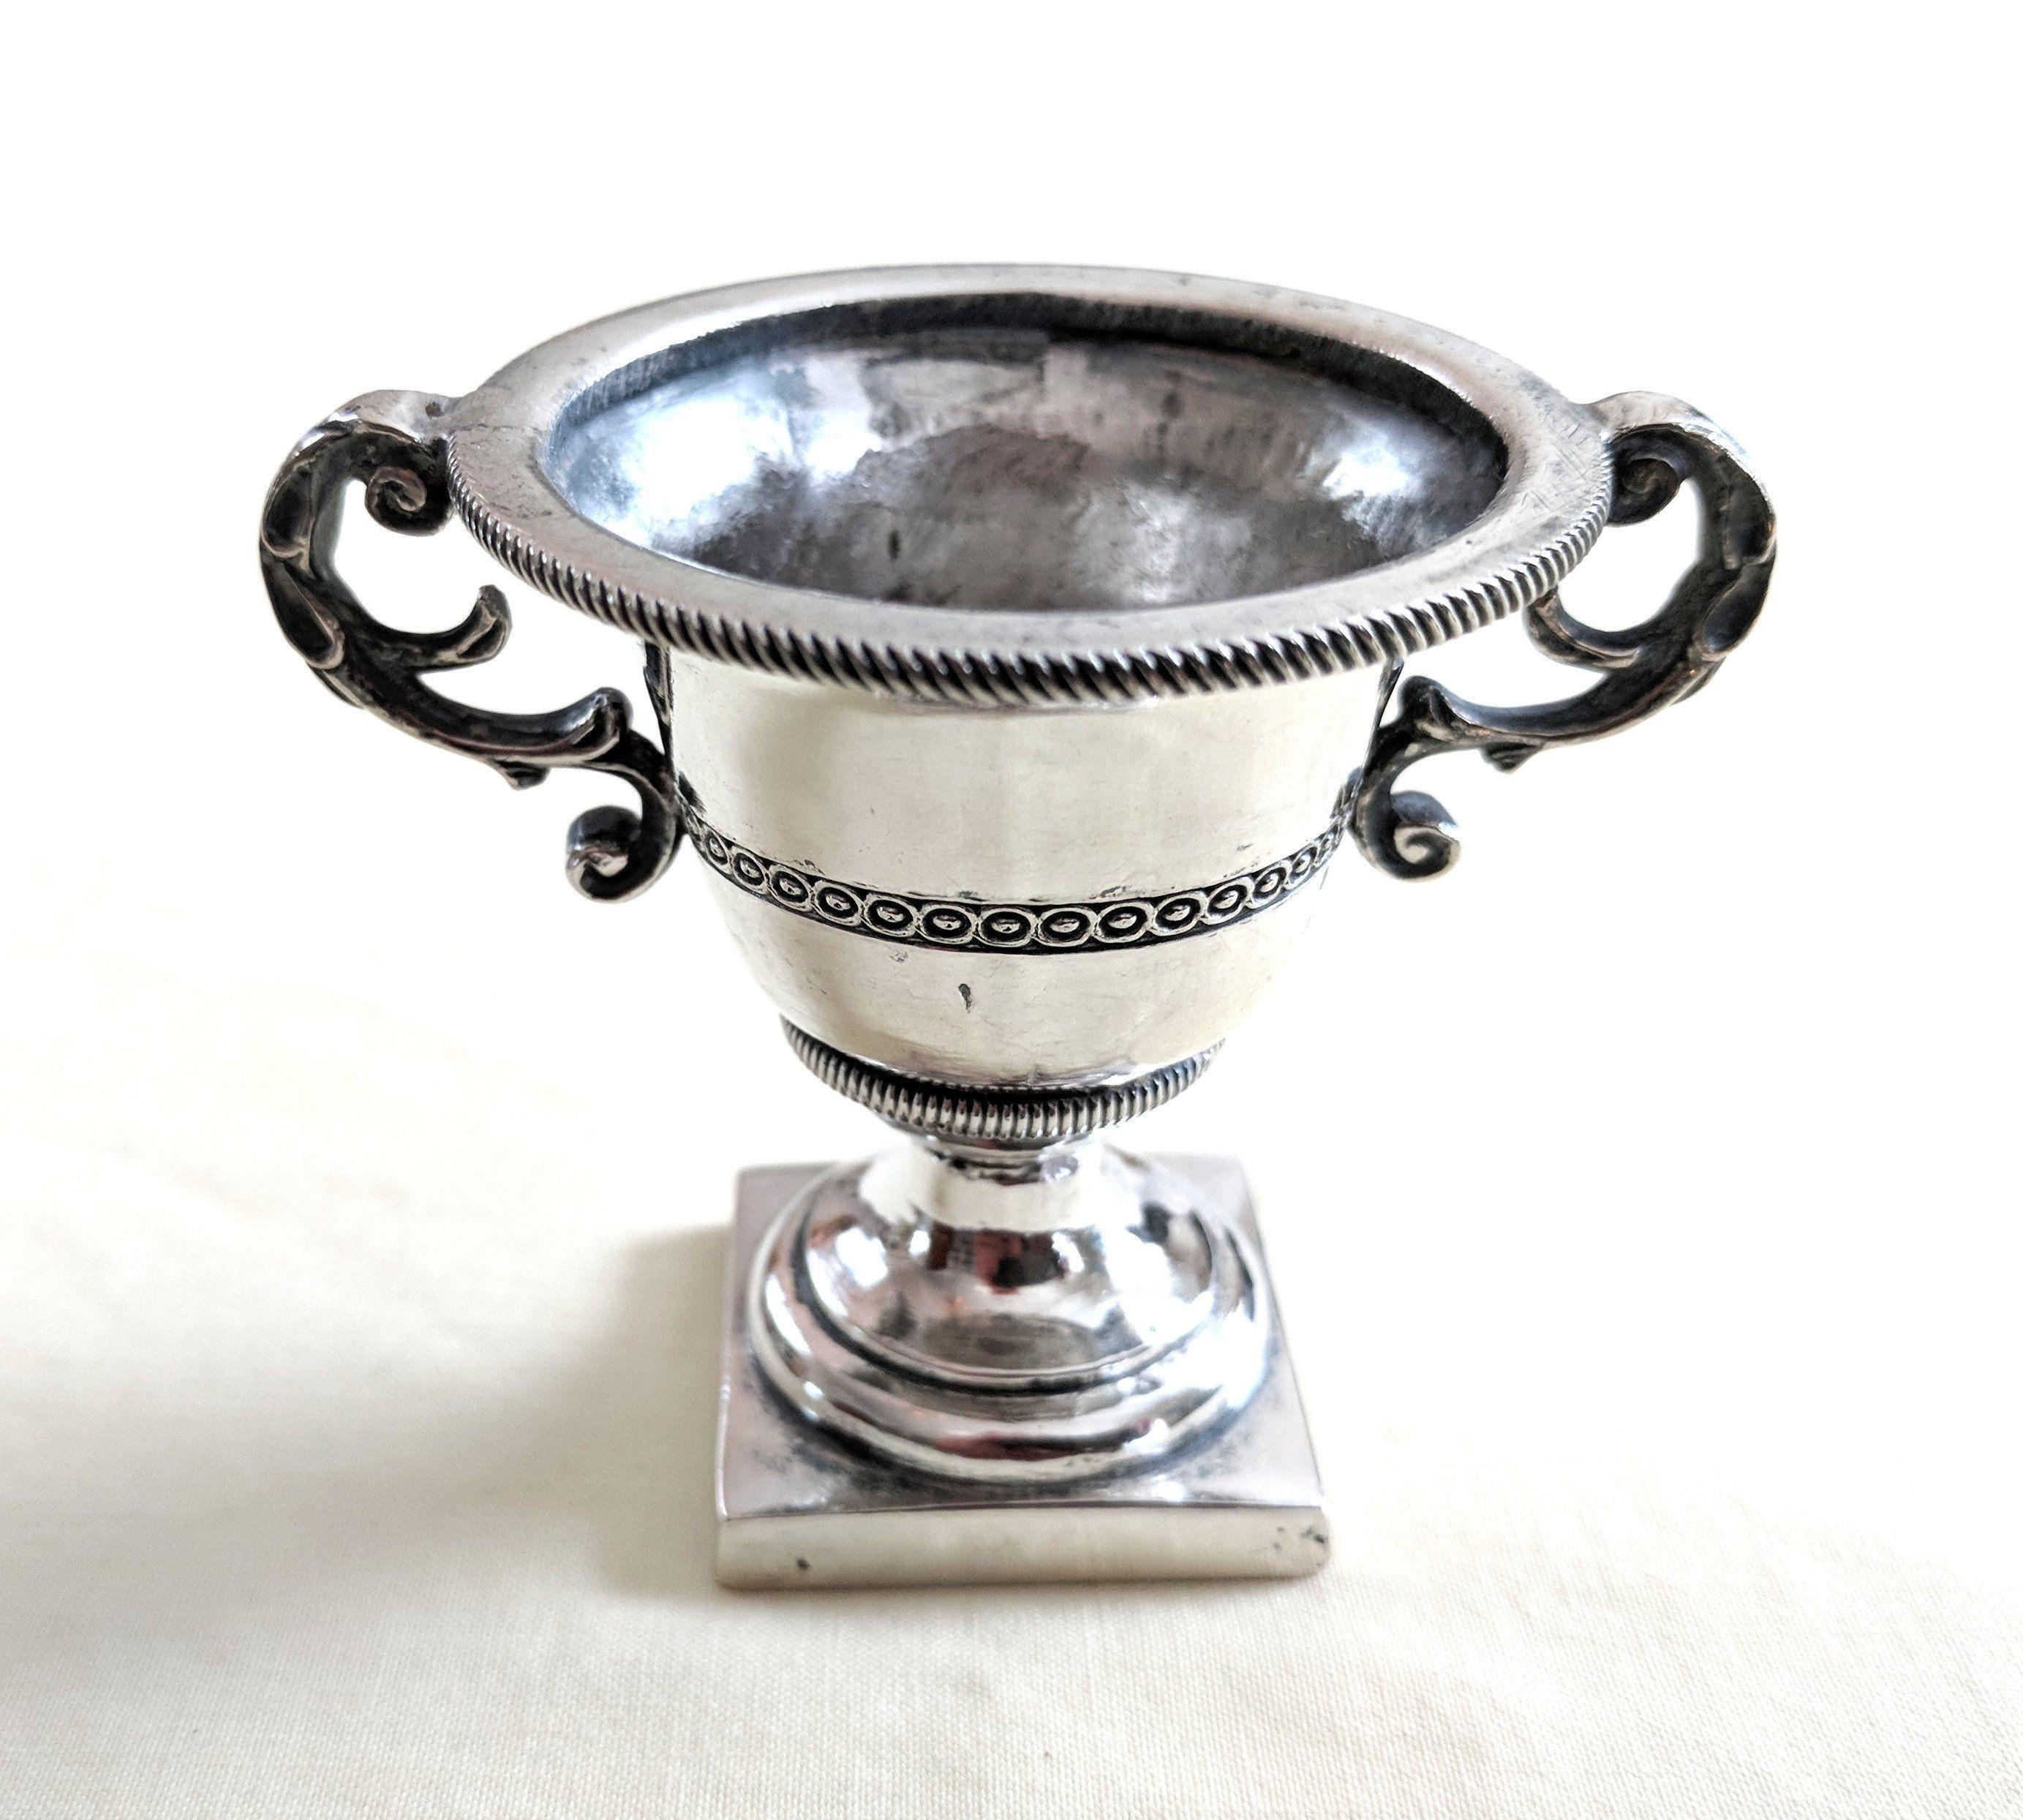 metal trumpet vase of miniature 800 silver double handled trumpet style vase vintage in miniature 800 silver double handled trumpet style vase